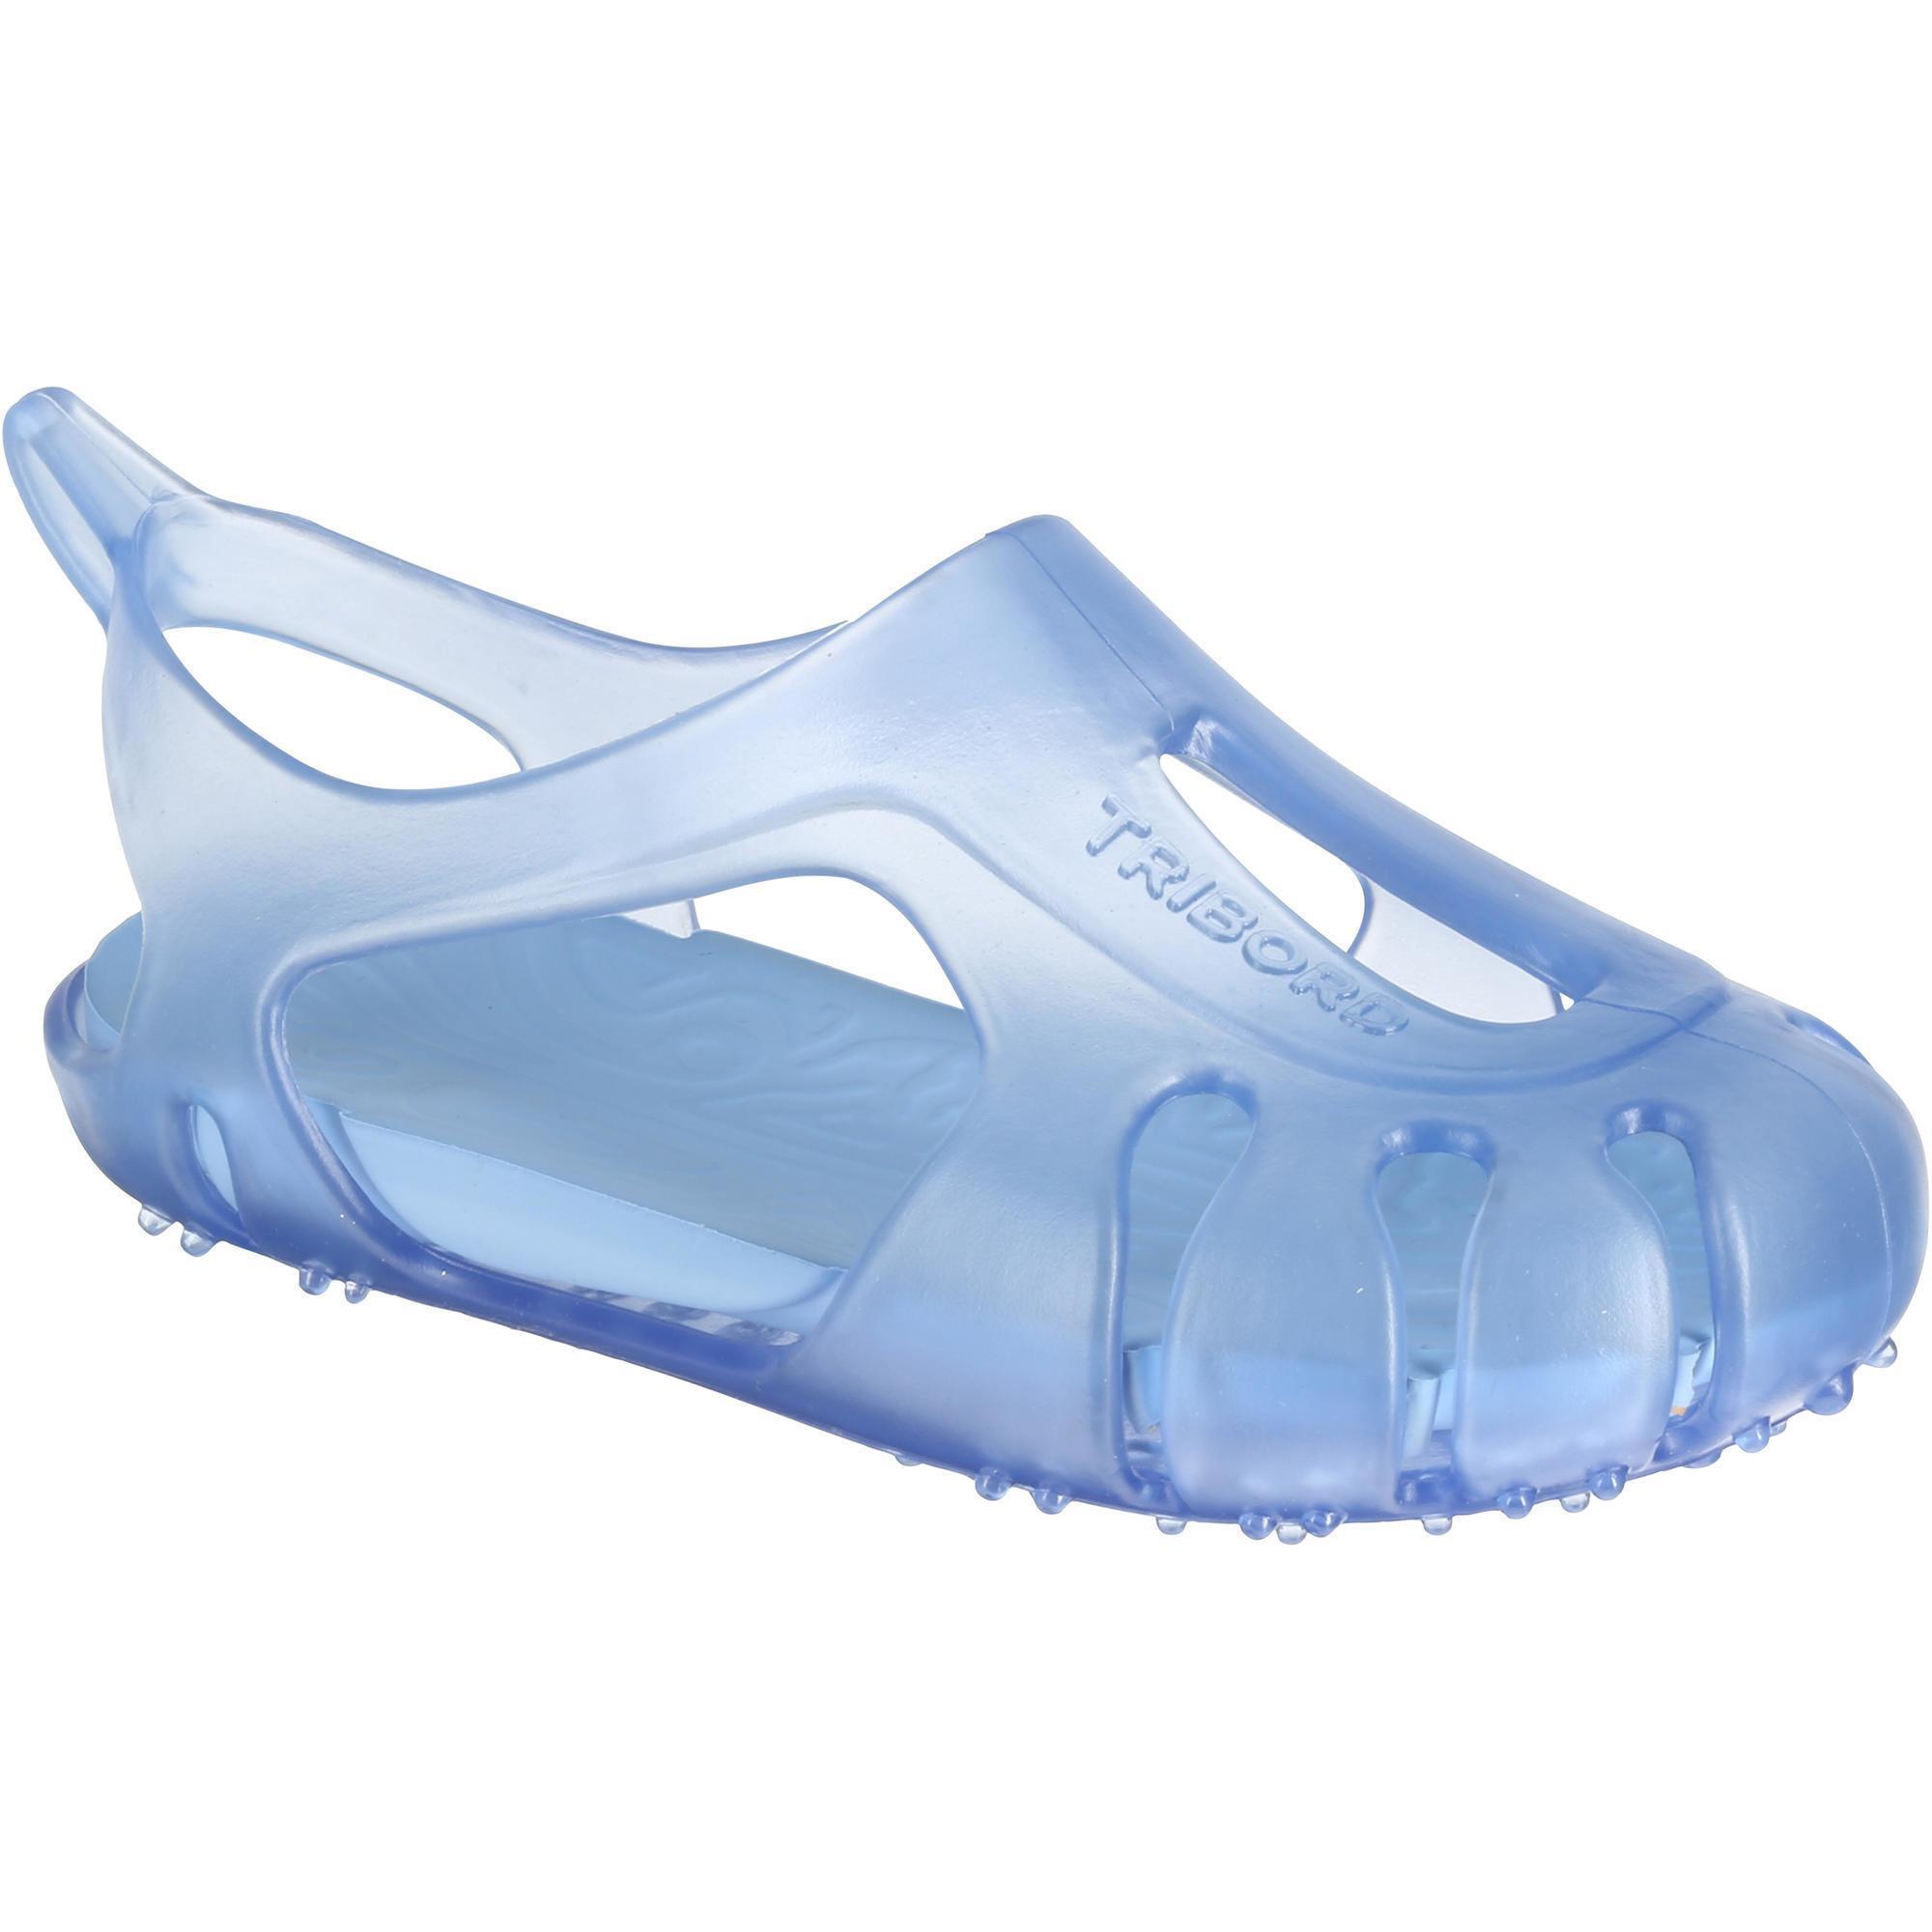 chaussons natation bebe aquashoes ssl 100 bb bleu nabaiji. Black Bedroom Furniture Sets. Home Design Ideas